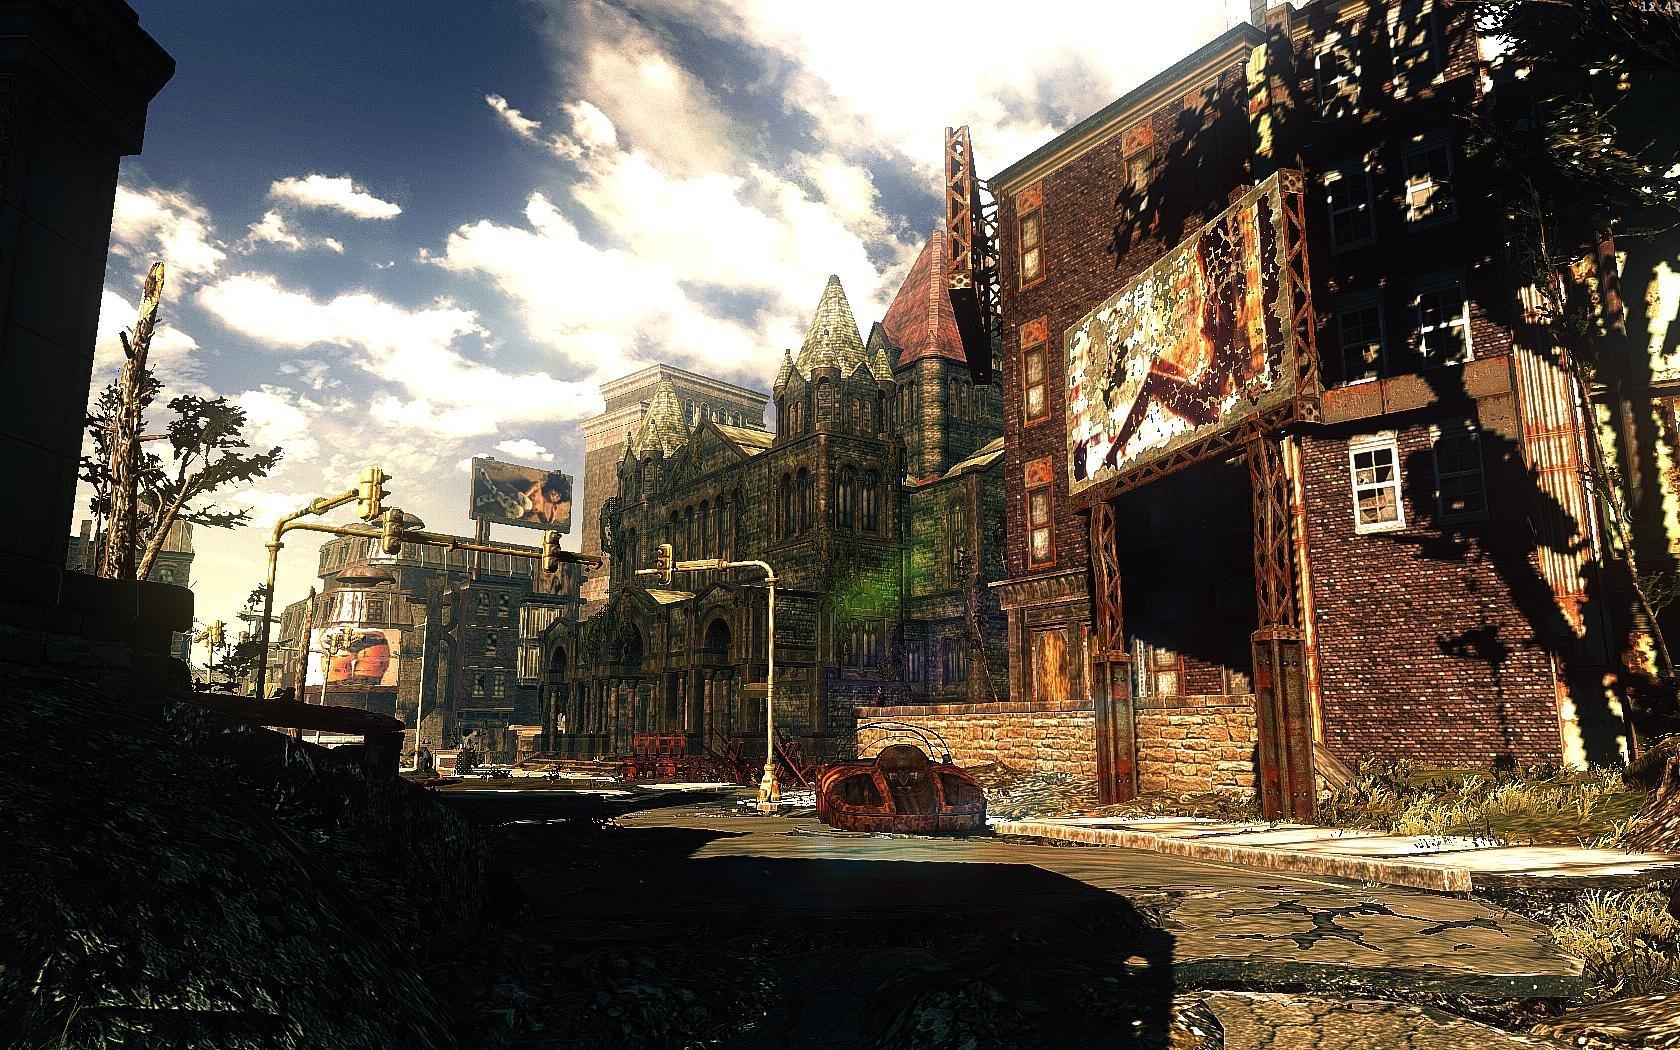 Fallout4 2019-02-13 12-43-47-12